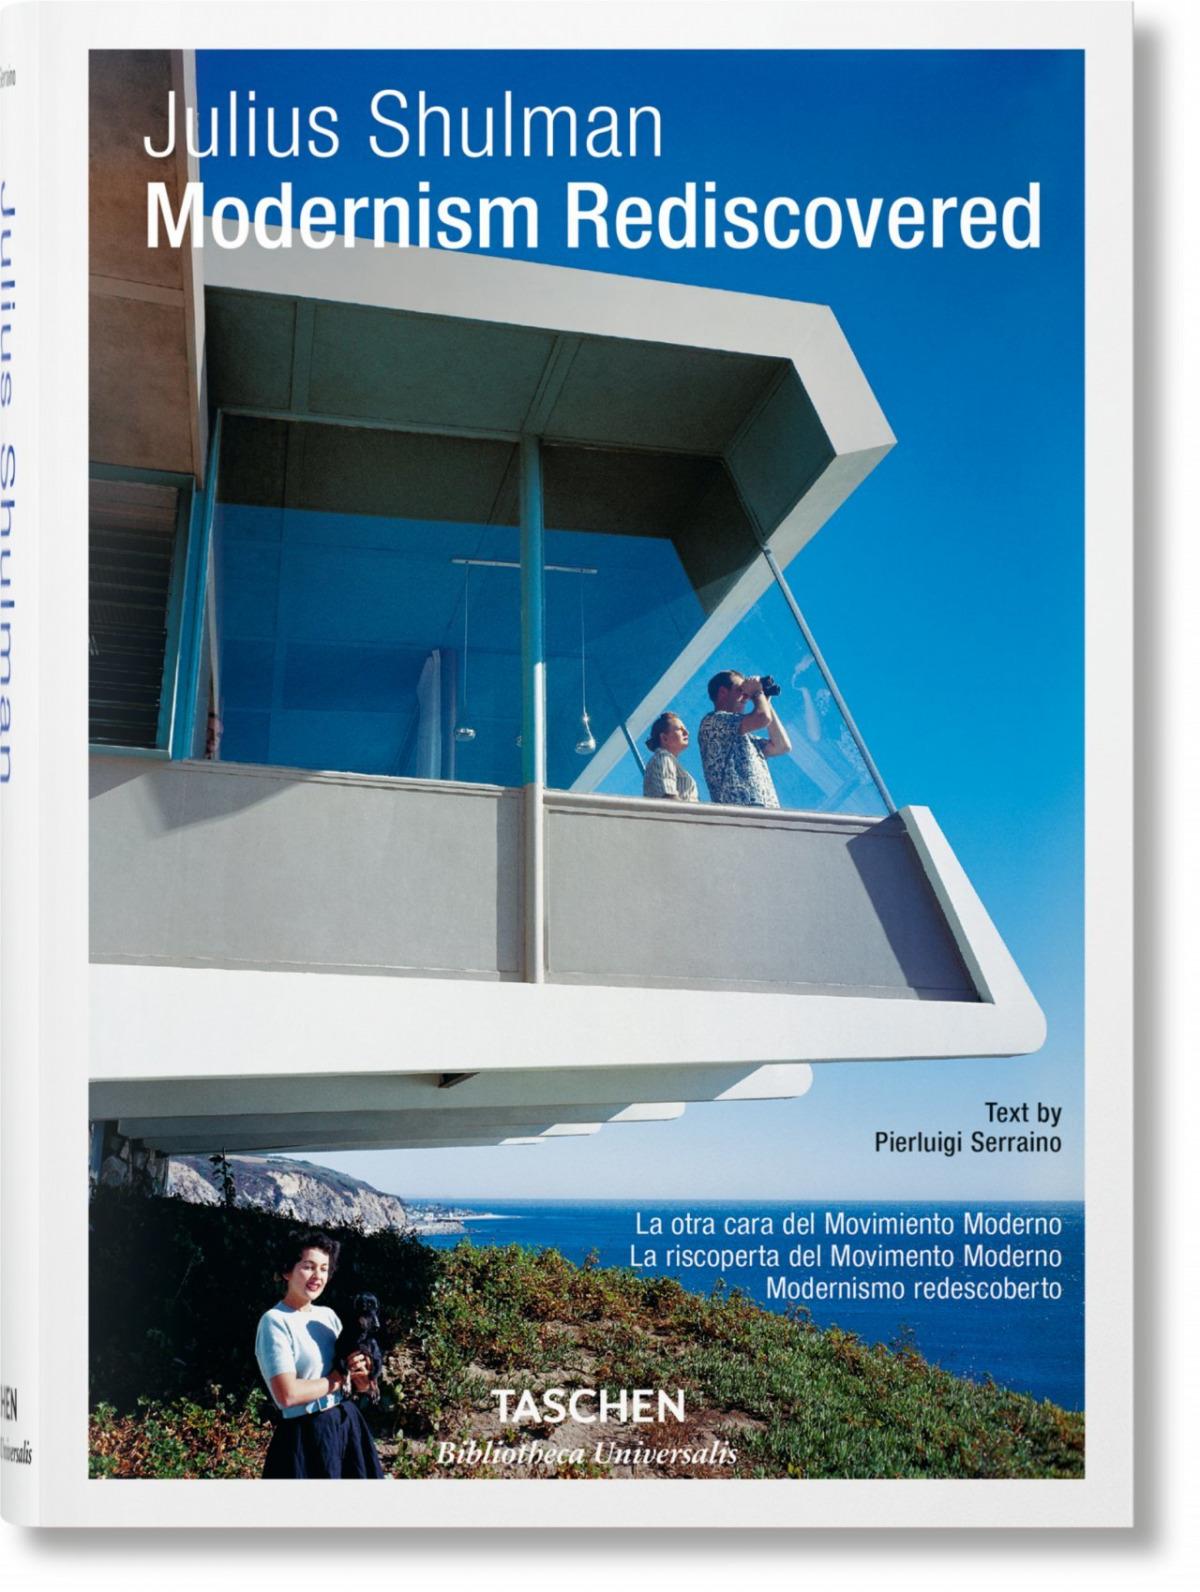 Modernism rediscovered - Shulman, Julius